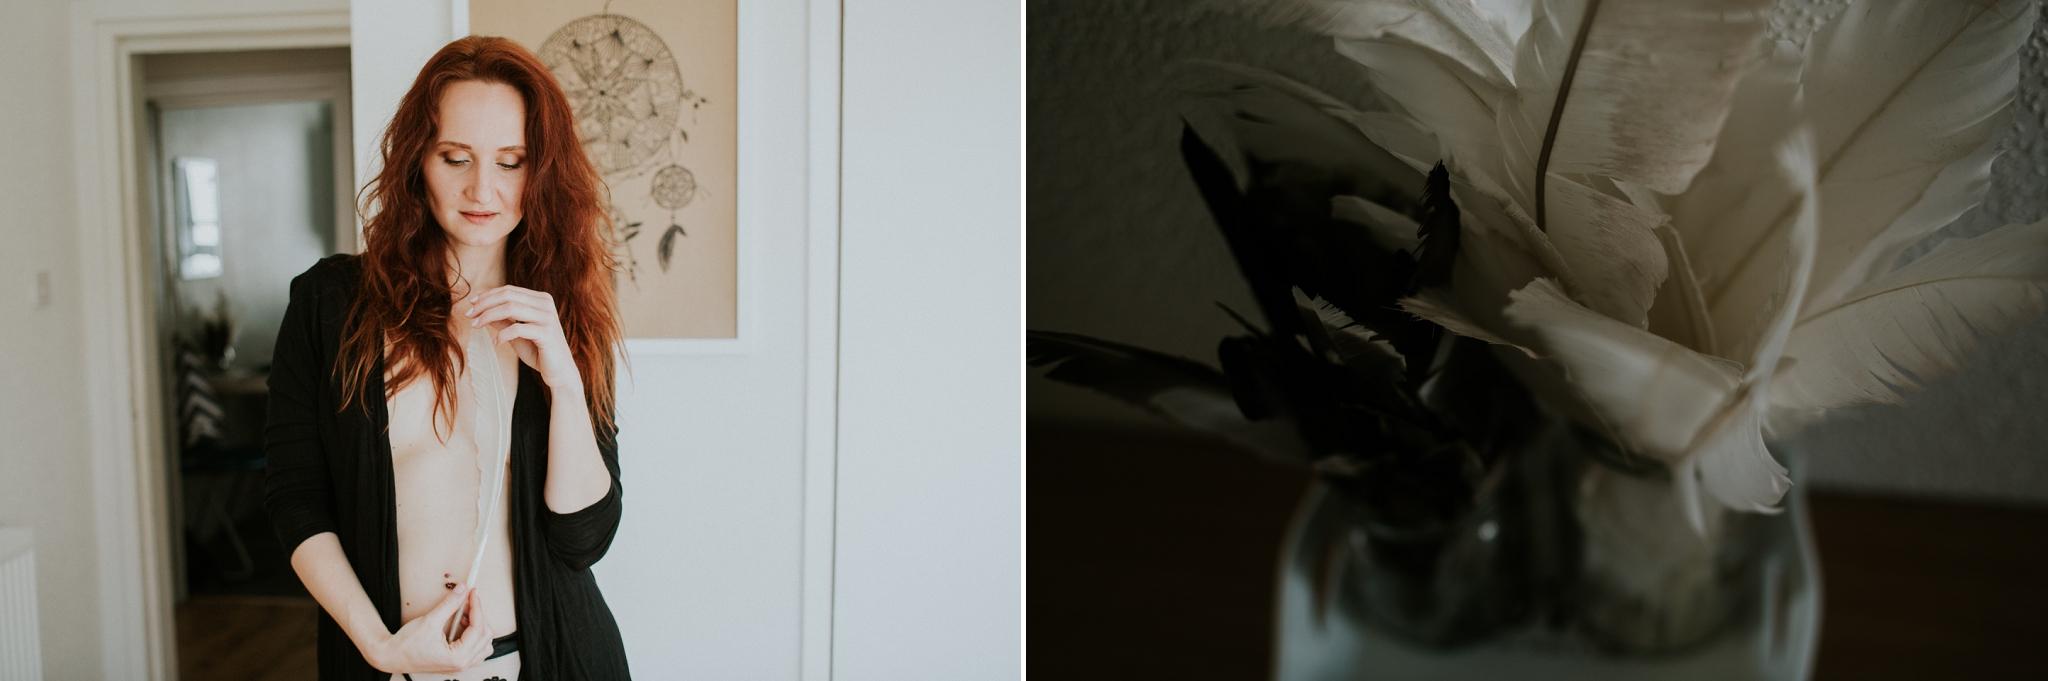 Glasgow boudoir photographer | Sue-Slique Photography 2017